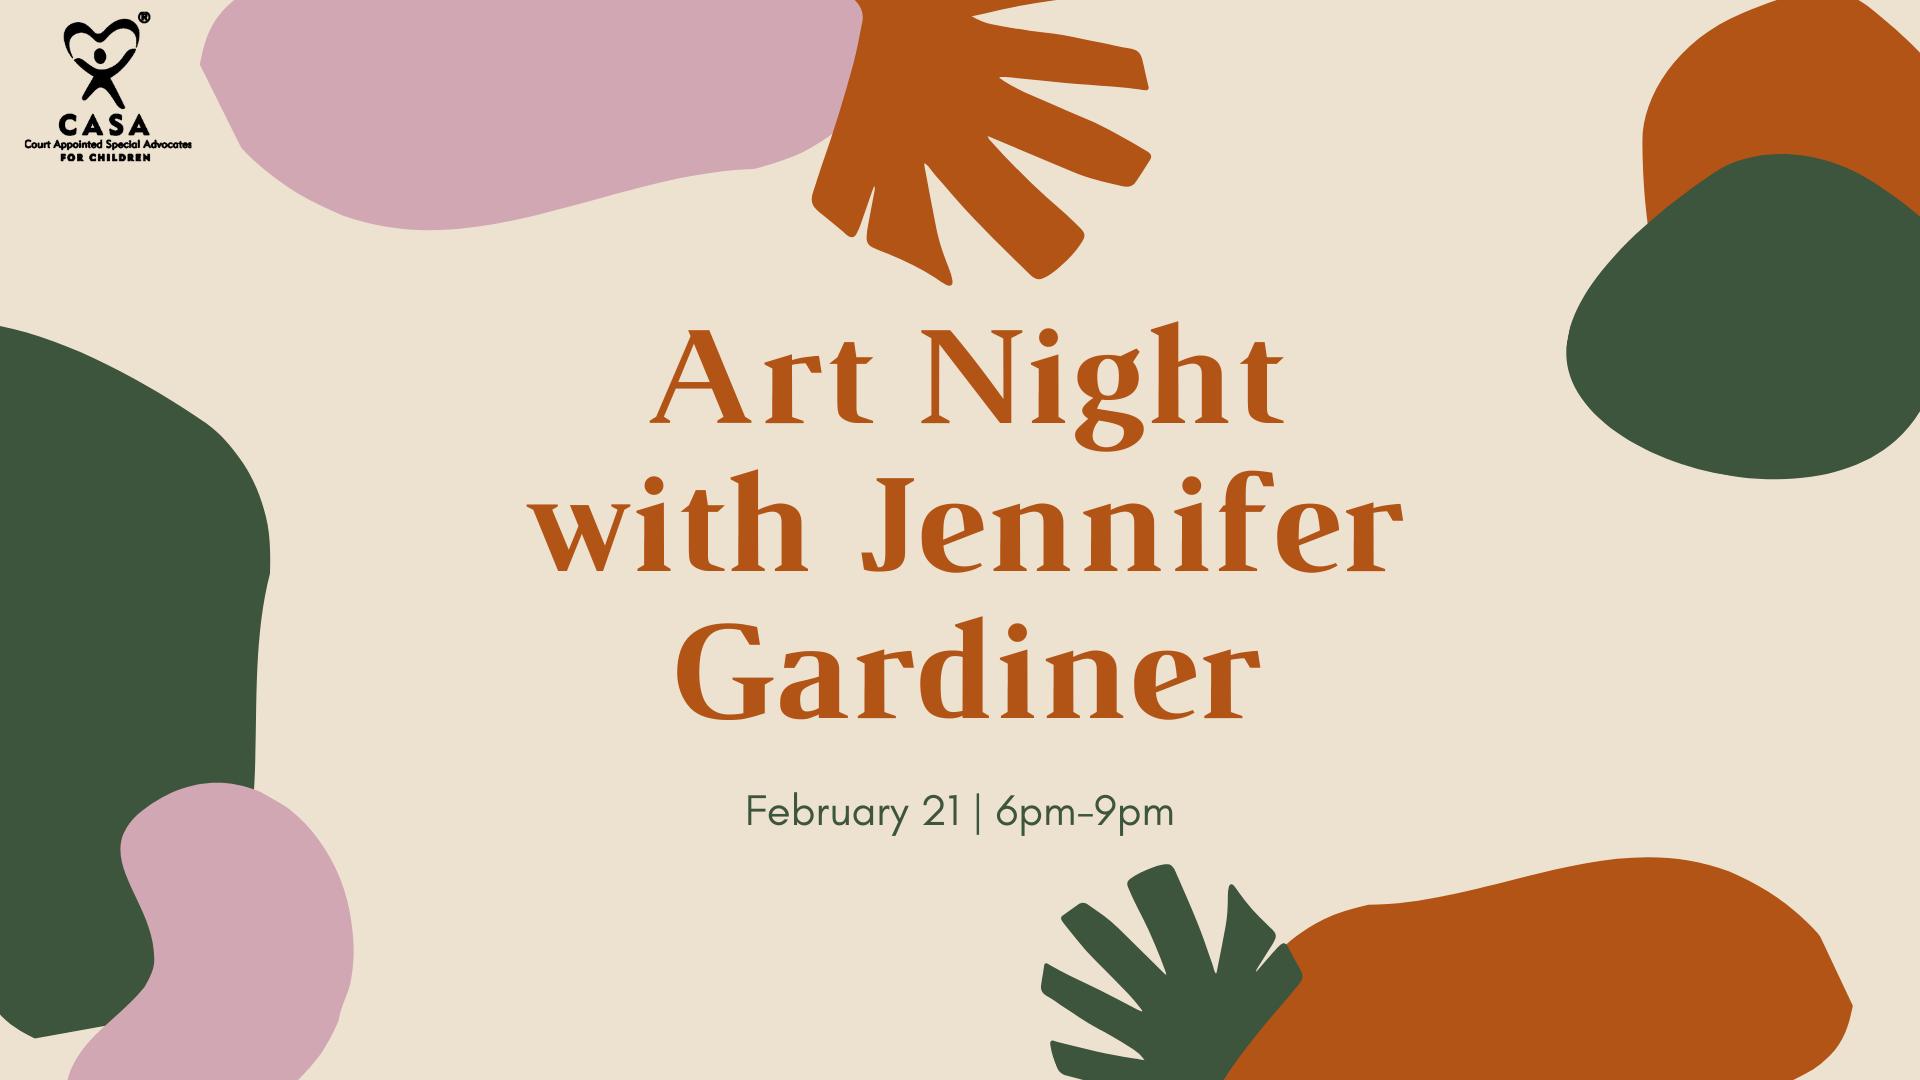 Art Night with Jennifer Gardiner